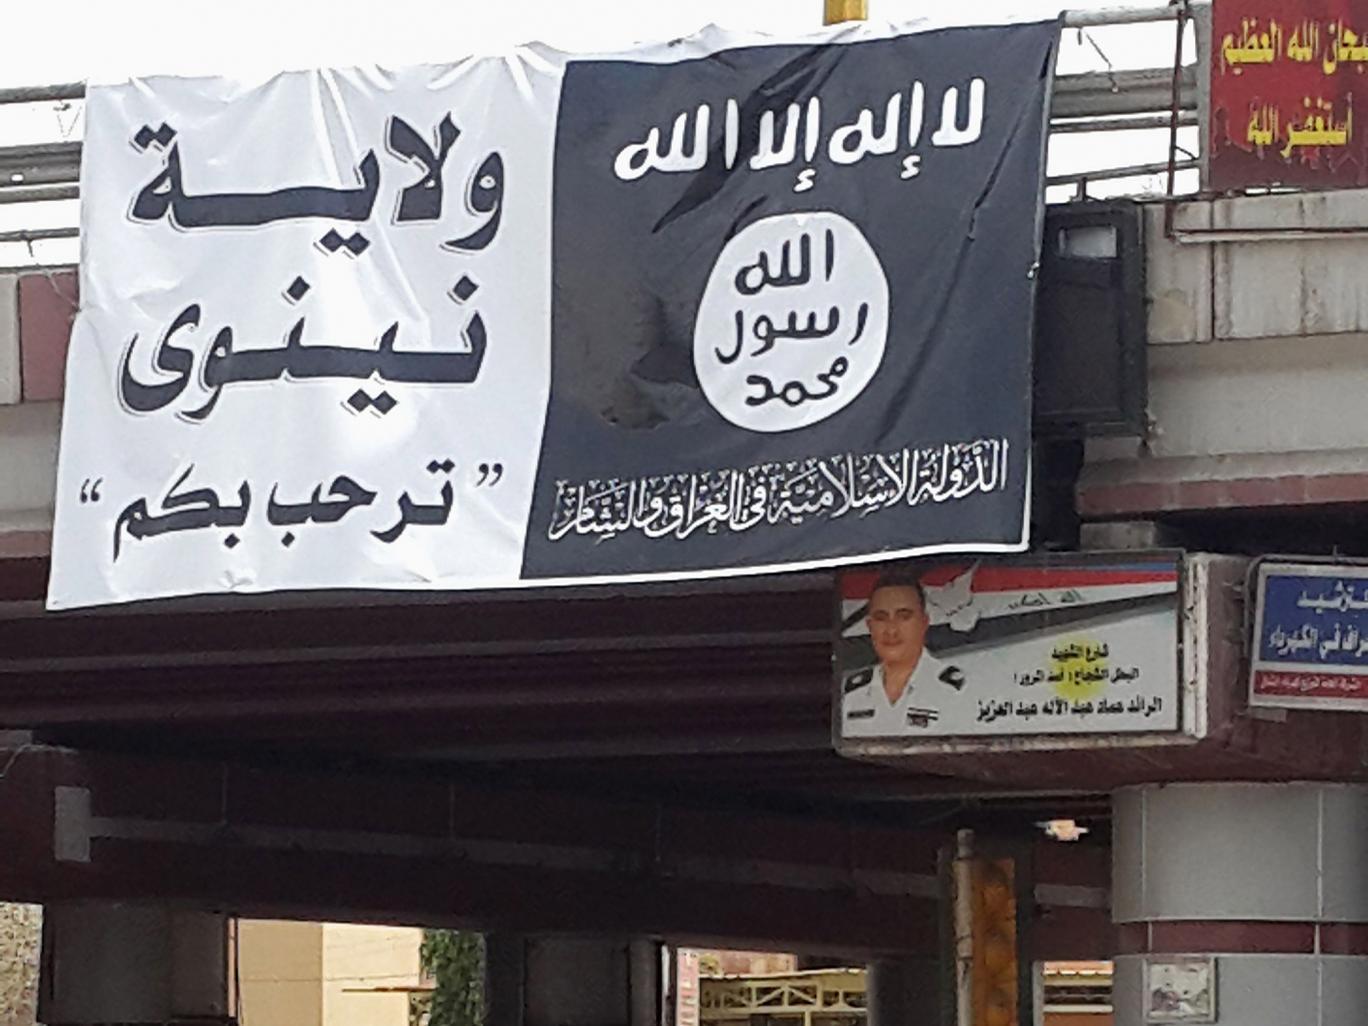 FRONTEX: ISIS-i po armatos refugjatët